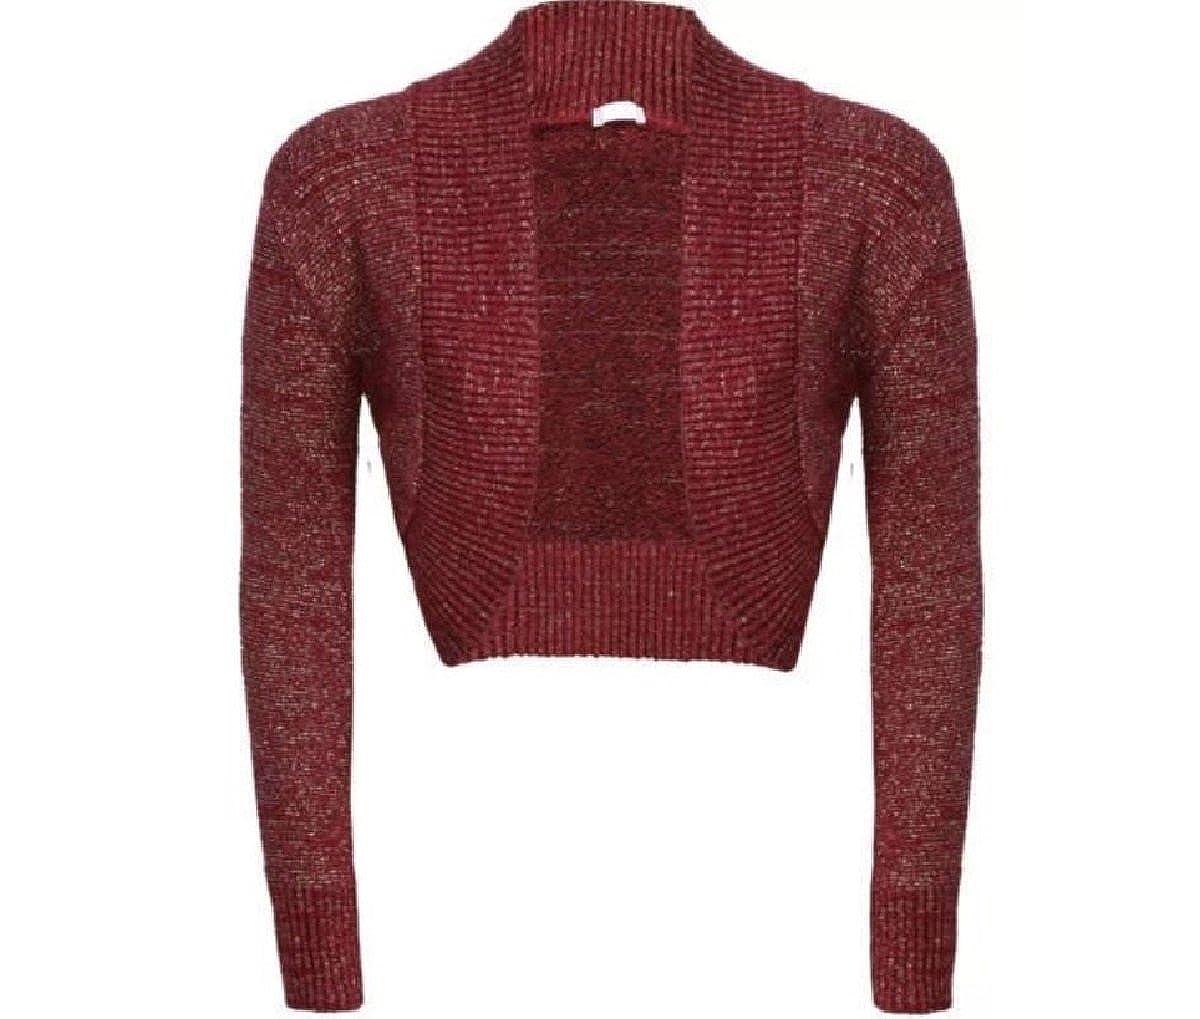 FLAVES FASHION (FF11 New Women's Shiny Knitted Lurex Bolero Long Sleeve Cropped Shrugs Cardigan